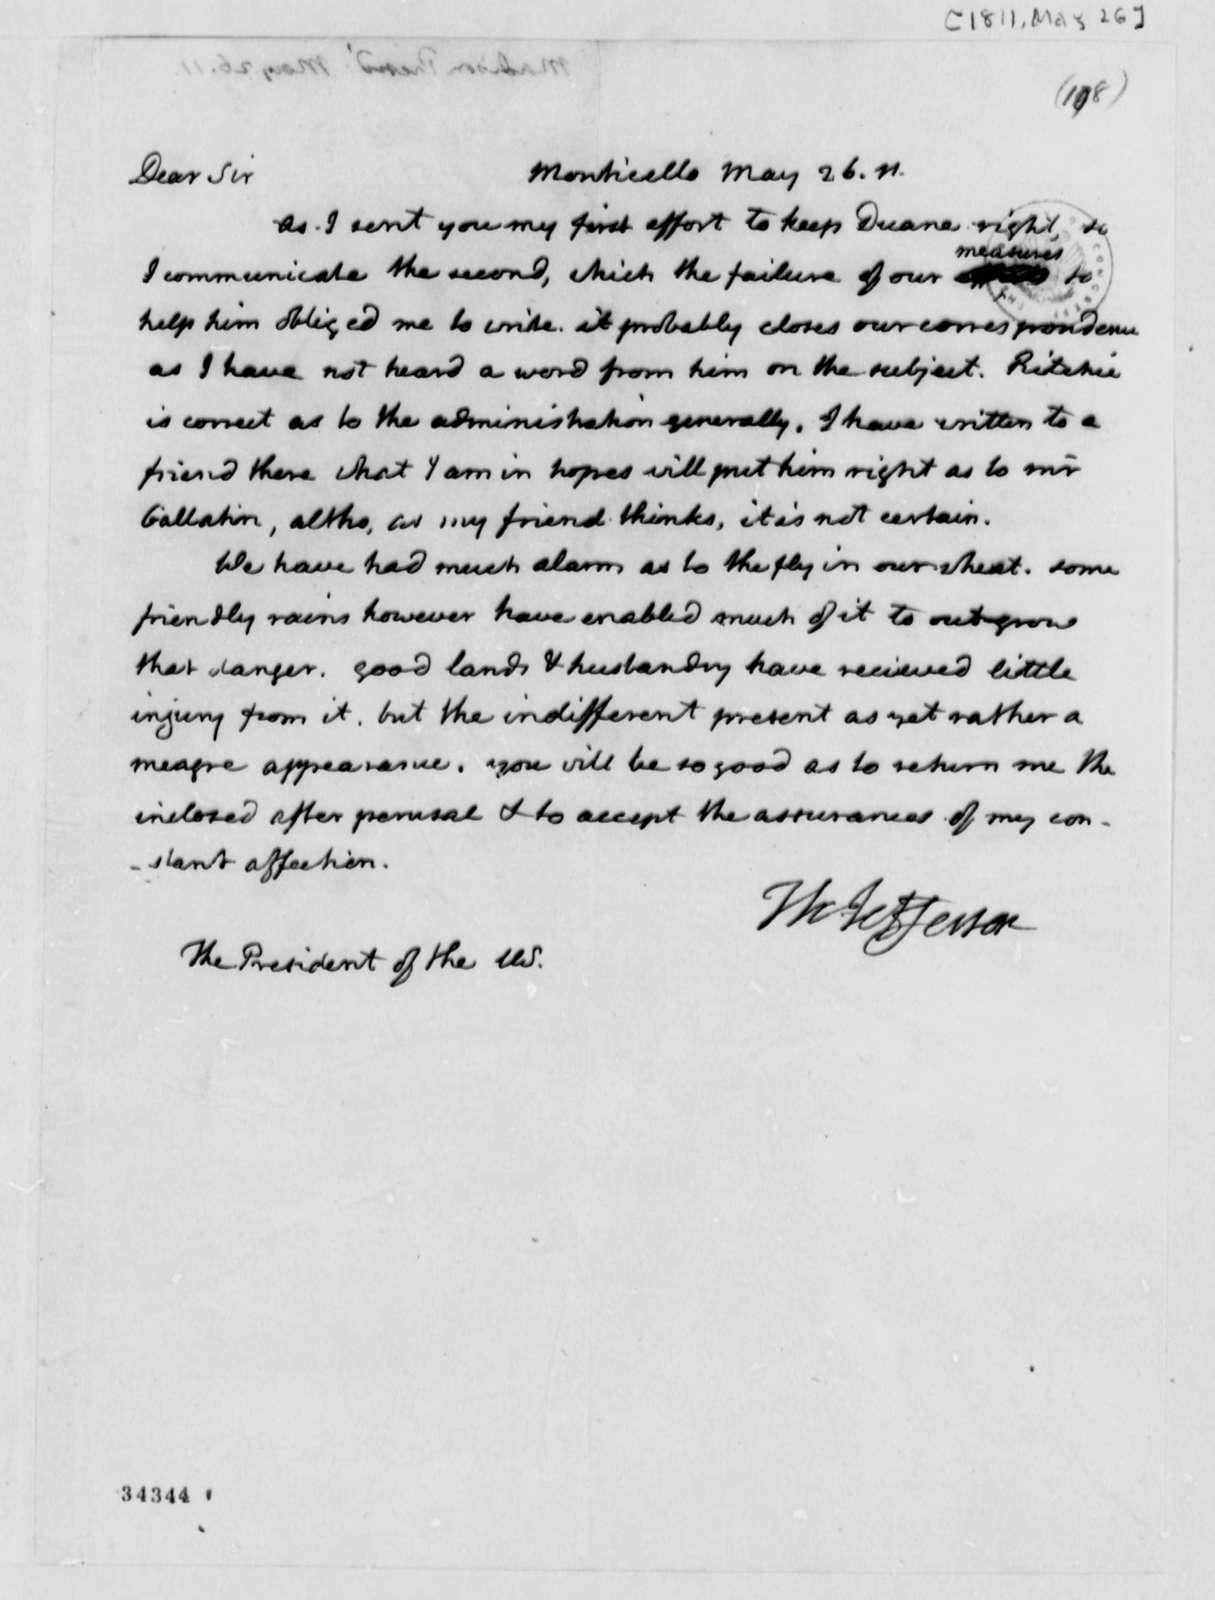 Thomas Jefferson to James Madison, May 26, 1811